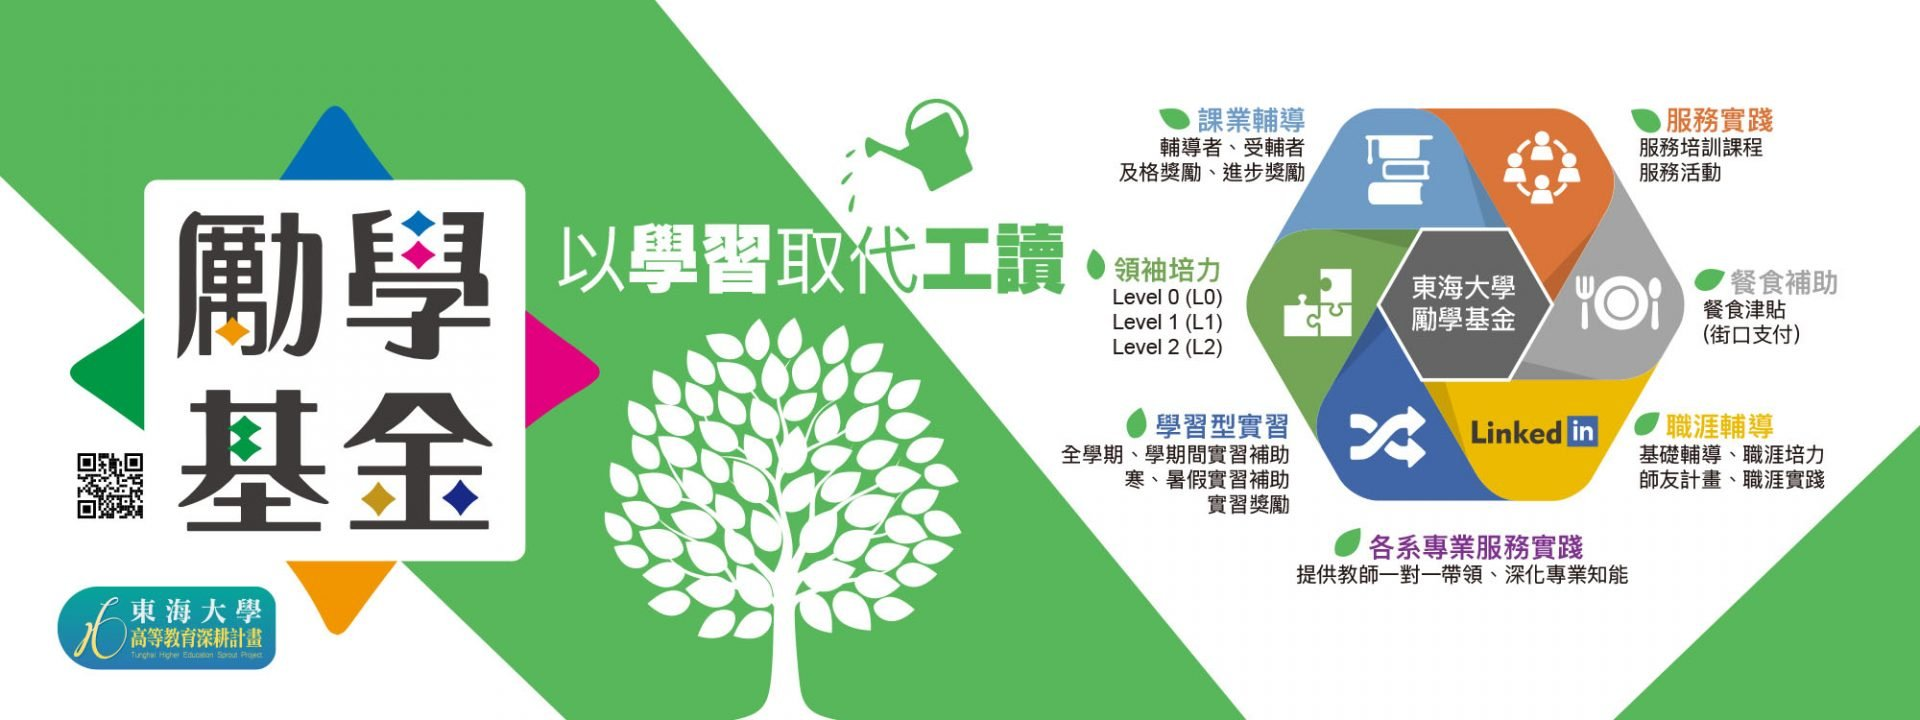 20191217-勵學基金 Banner 1440X540 pixel